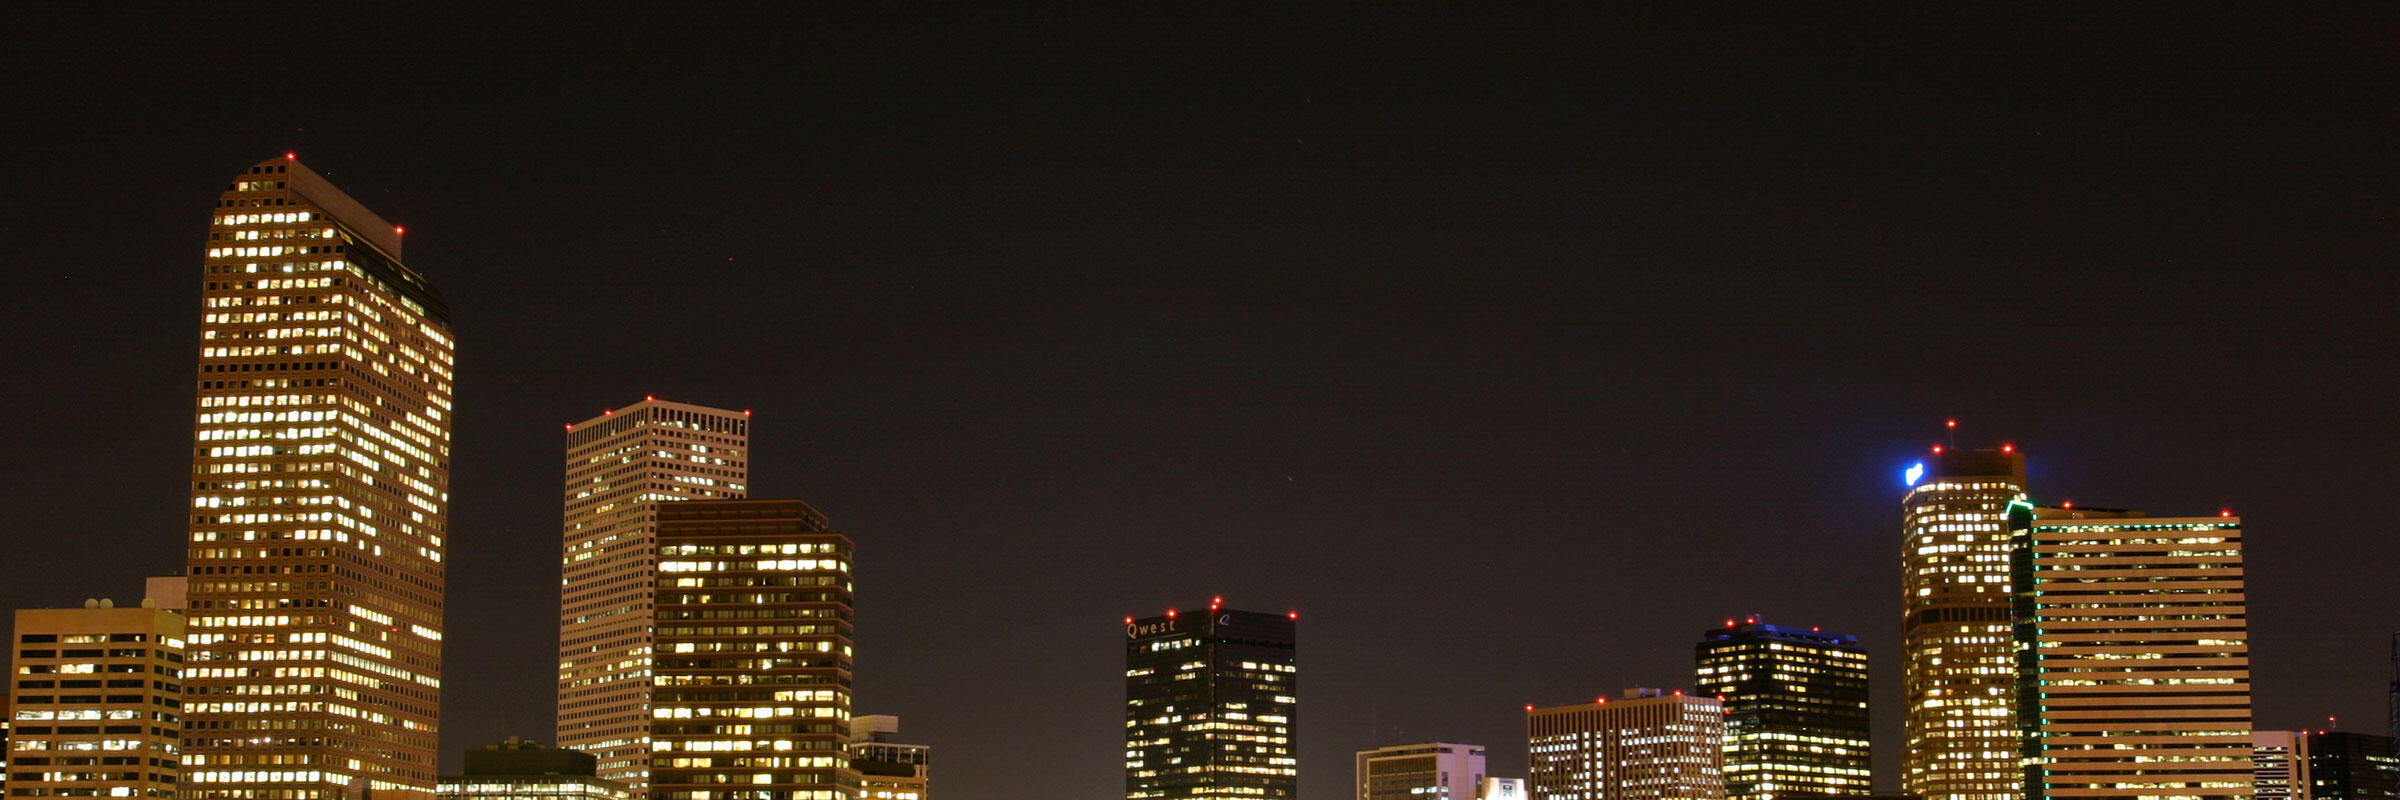 Buildings lit up at night in Denver.